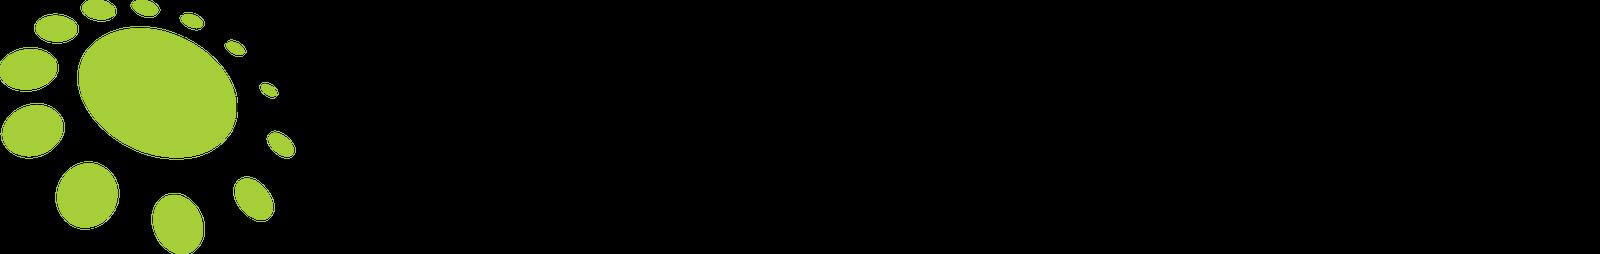 teletoriumonline